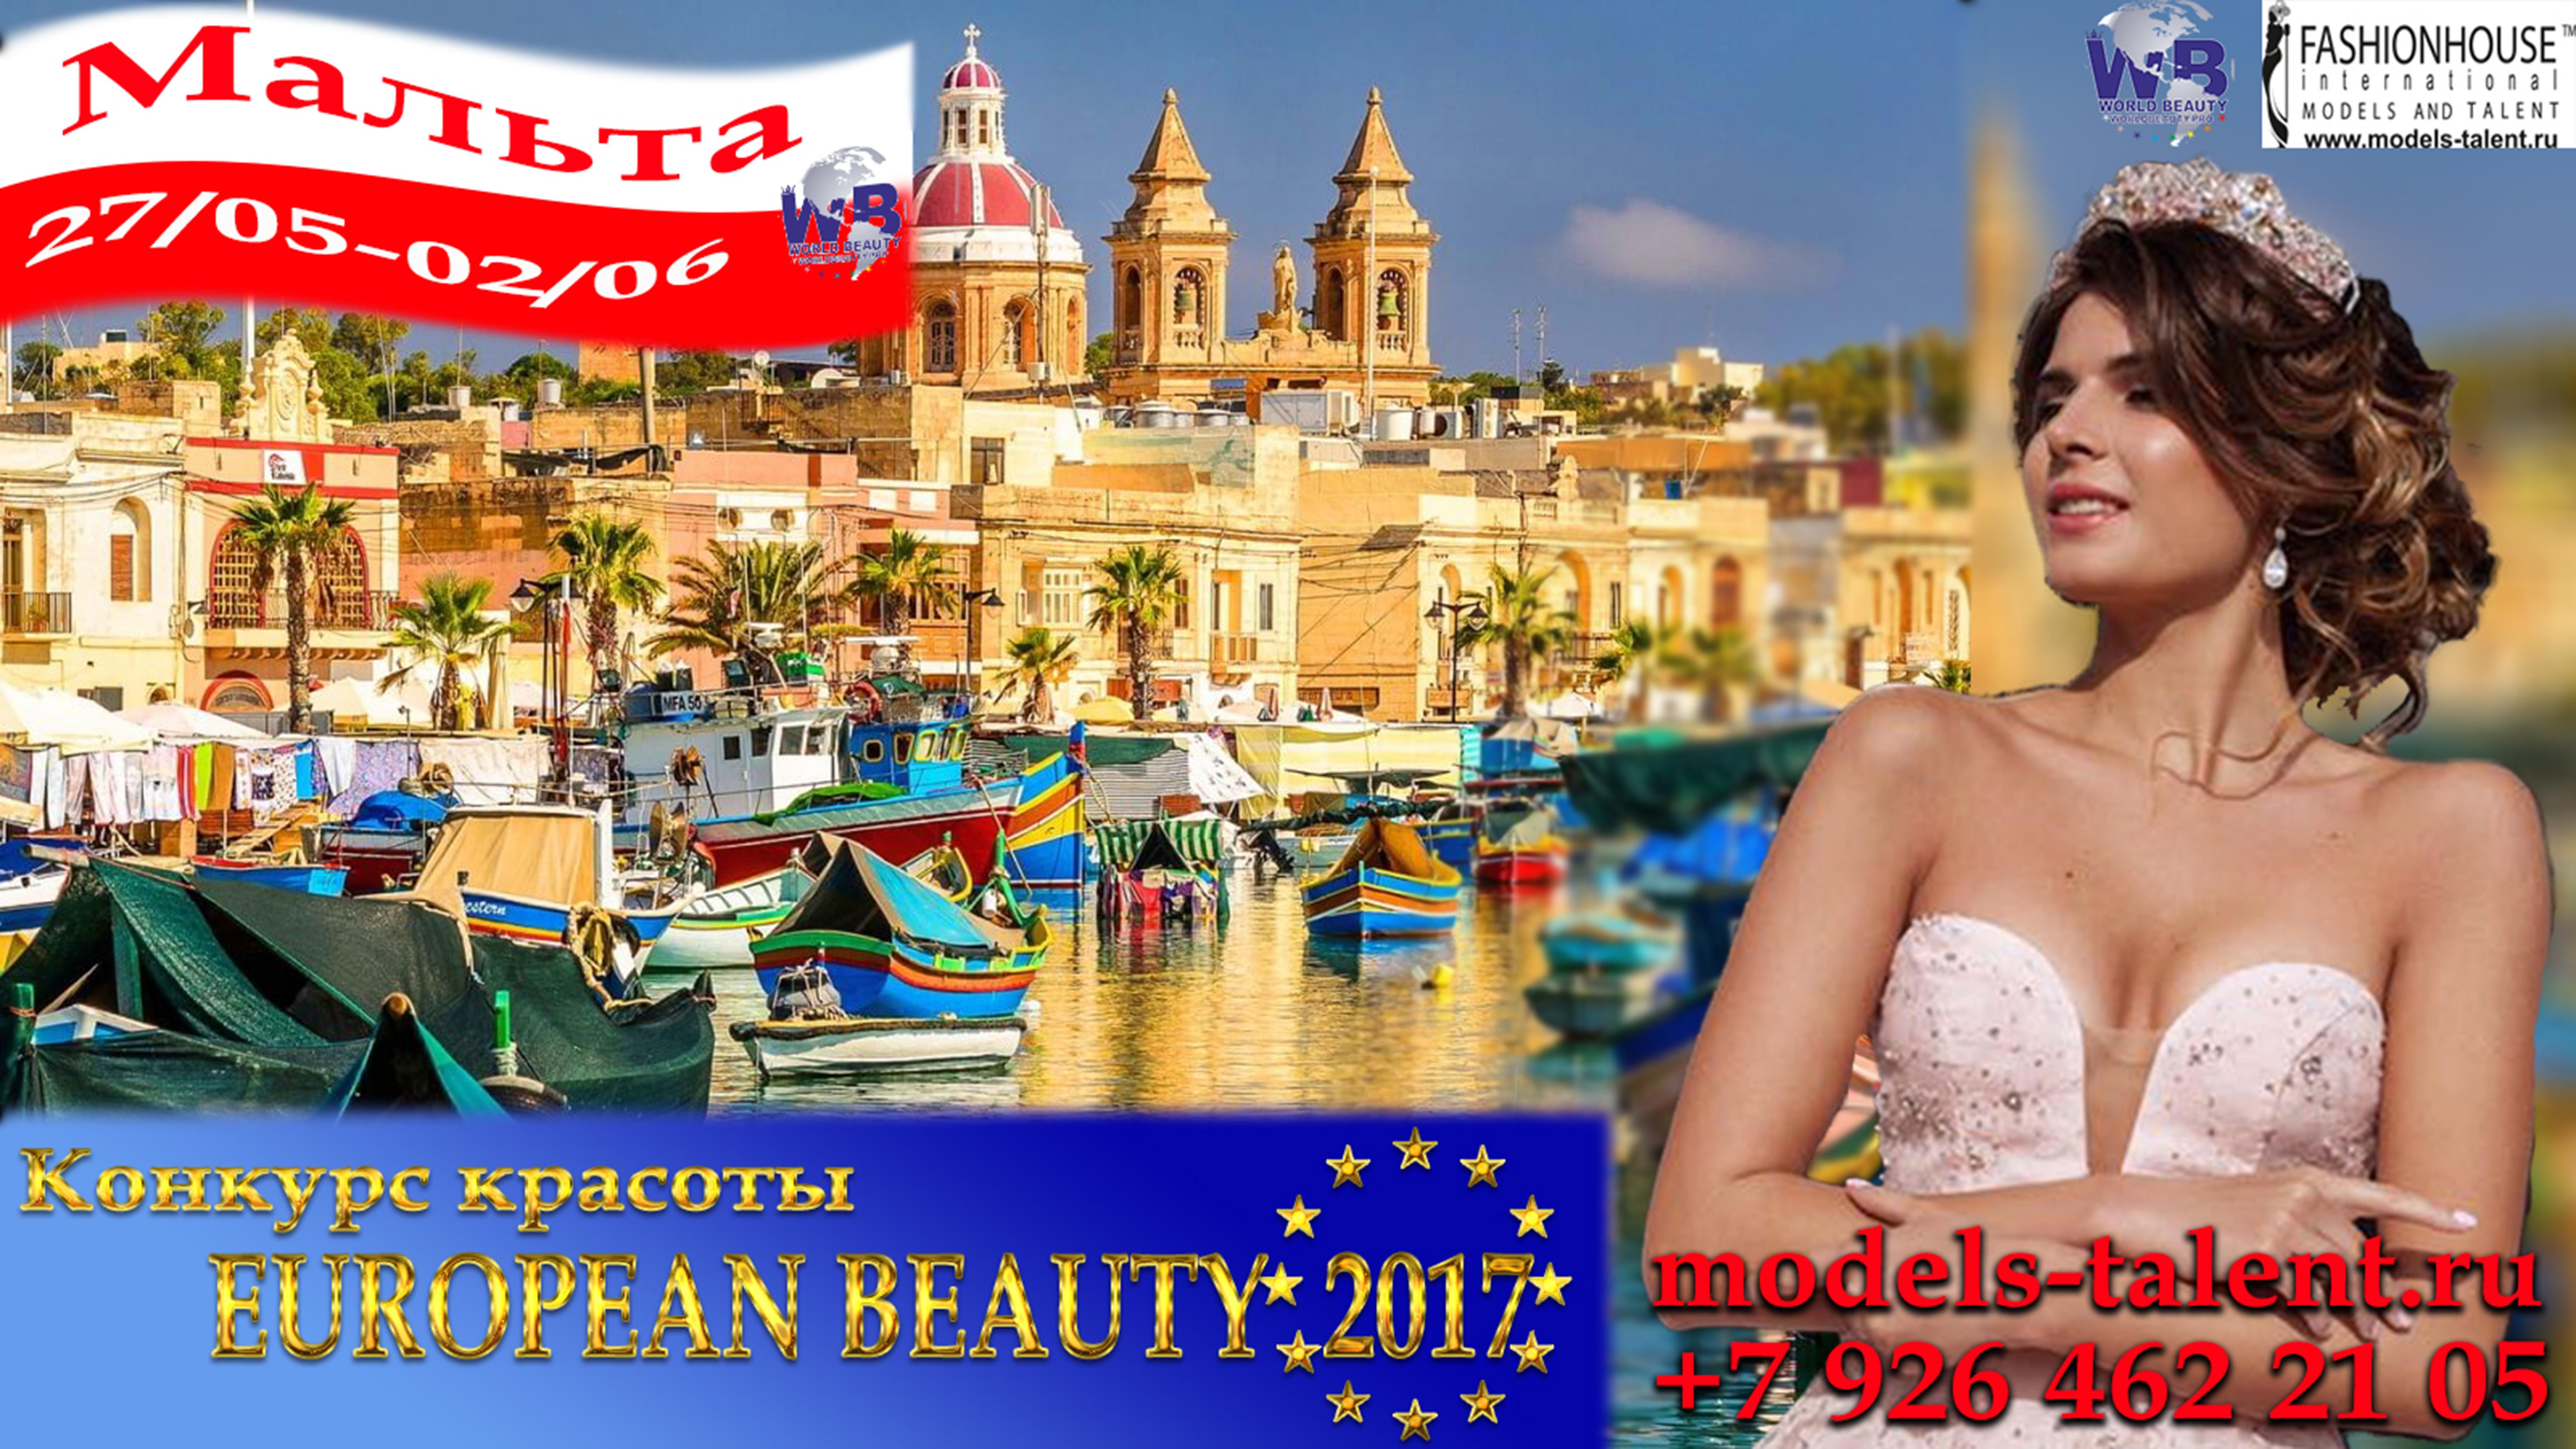 Конкурс красоты,моды и таланта «MISS EUROPEAN BEAUTY 2017 / ЕВРОПЕЙСКАЯ КРАСАВИЦА 2017»